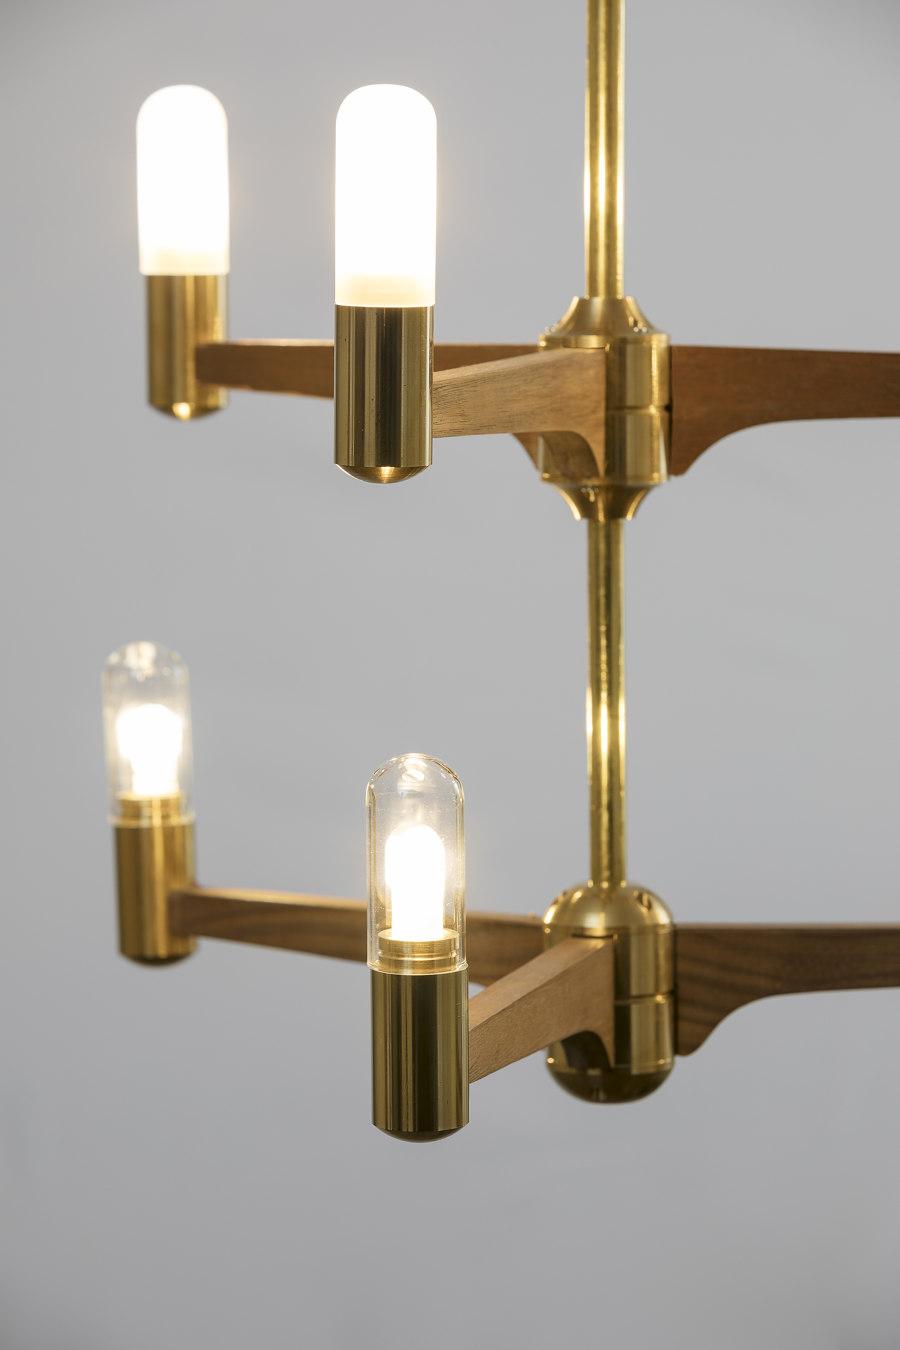 Lockdown lighting: Joe Scog | News